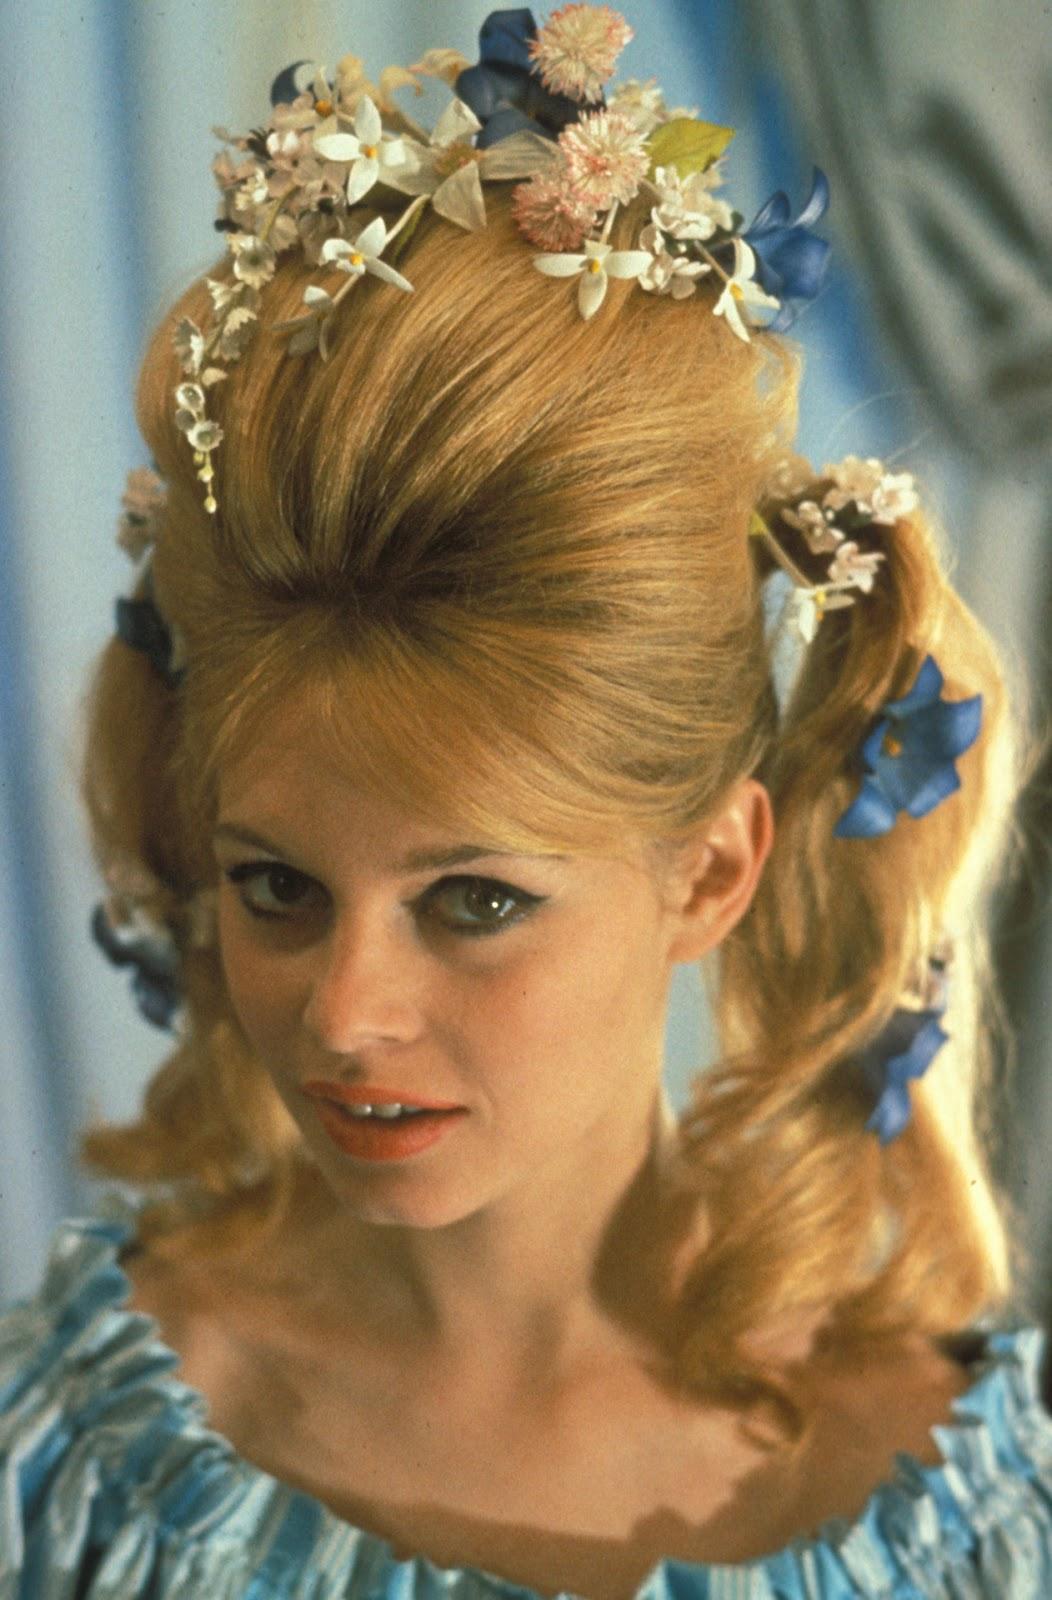 Brigitte Bardot With Flowers In Her Hair 24 Femmes Per Second